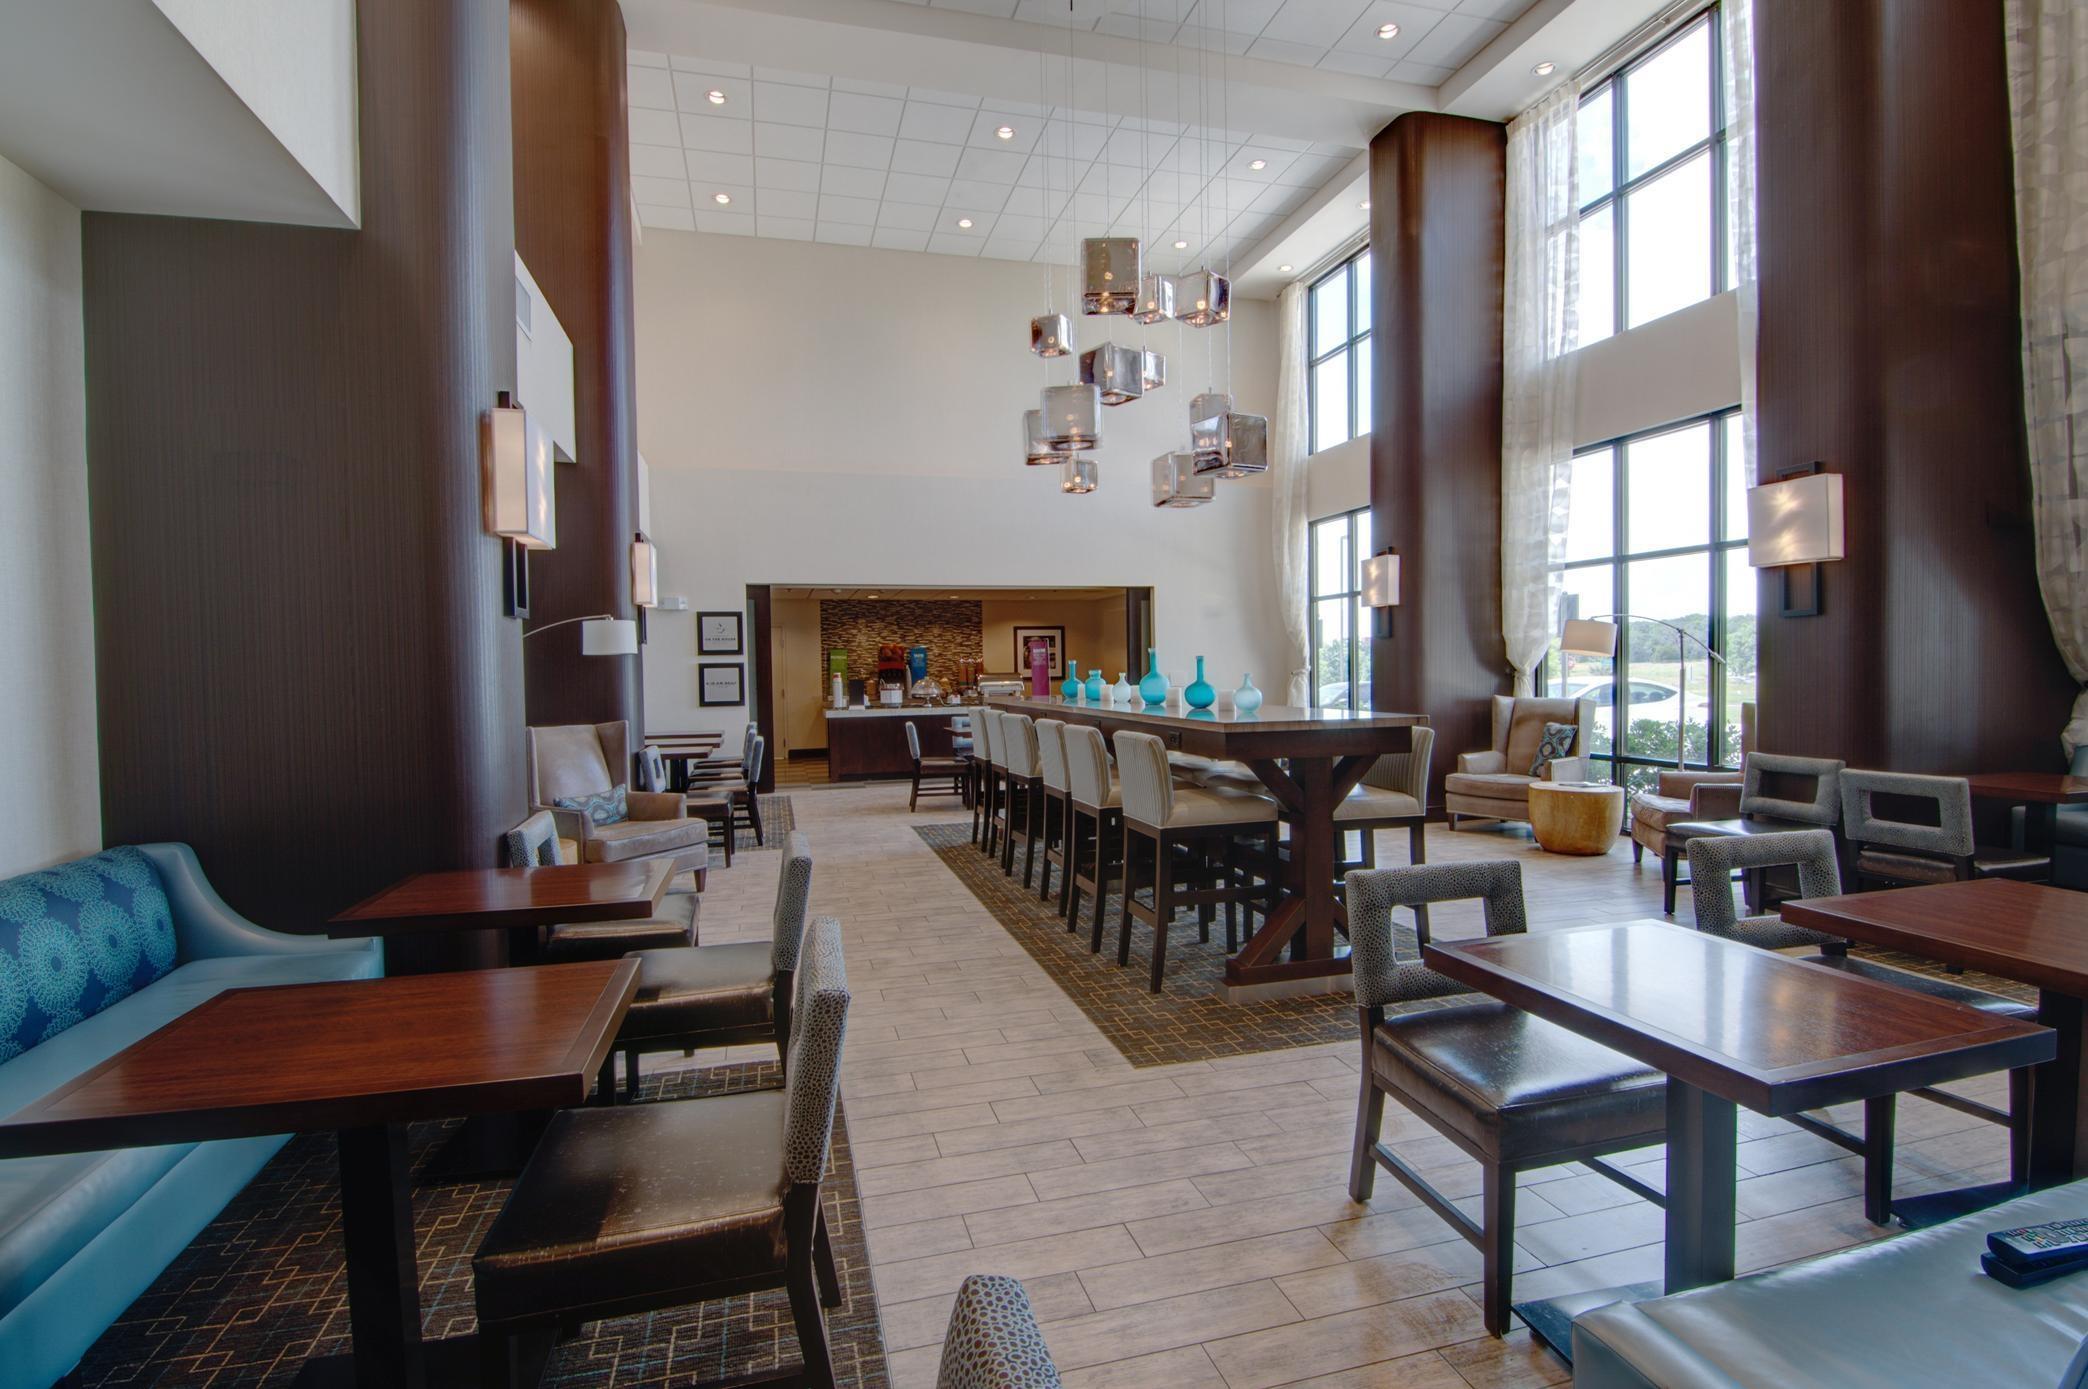 Hampton Inn & Suites Trophy Club - Fort Worth North image 4